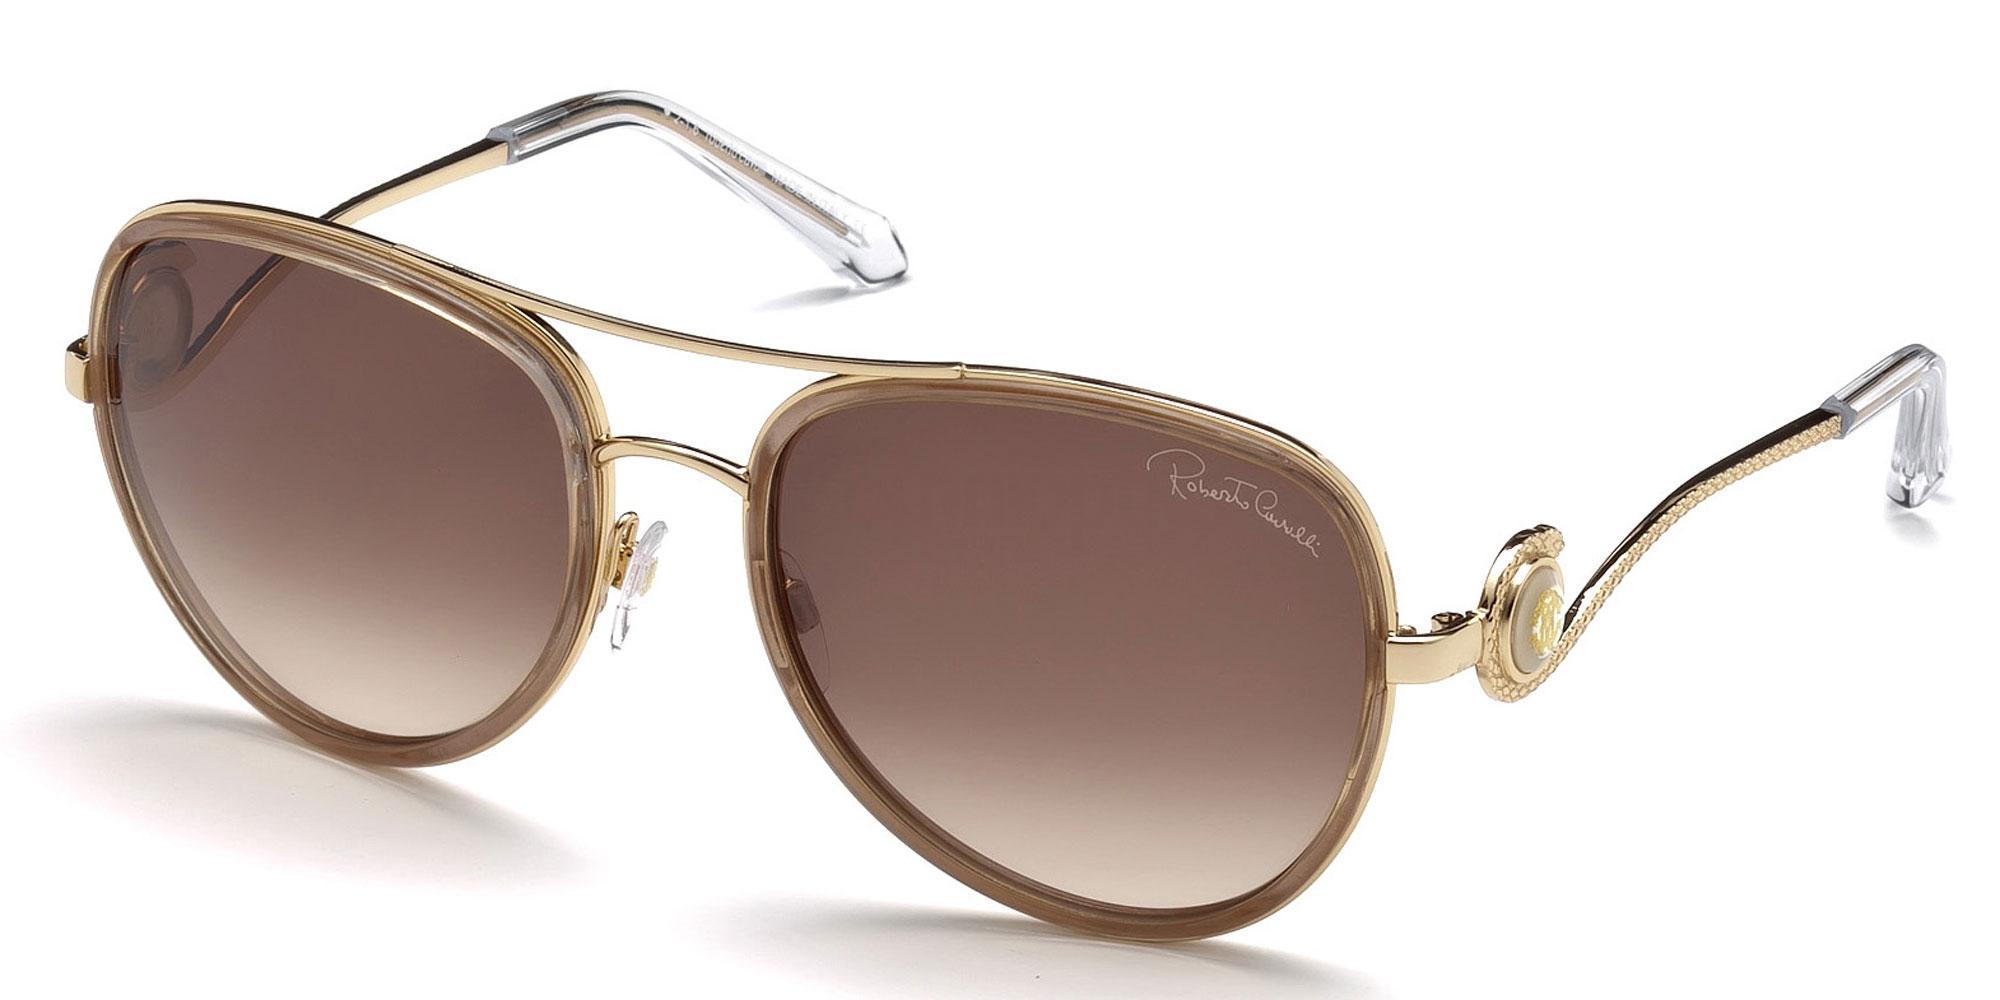 74F RC1013 Sunglasses, Roberto Cavalli